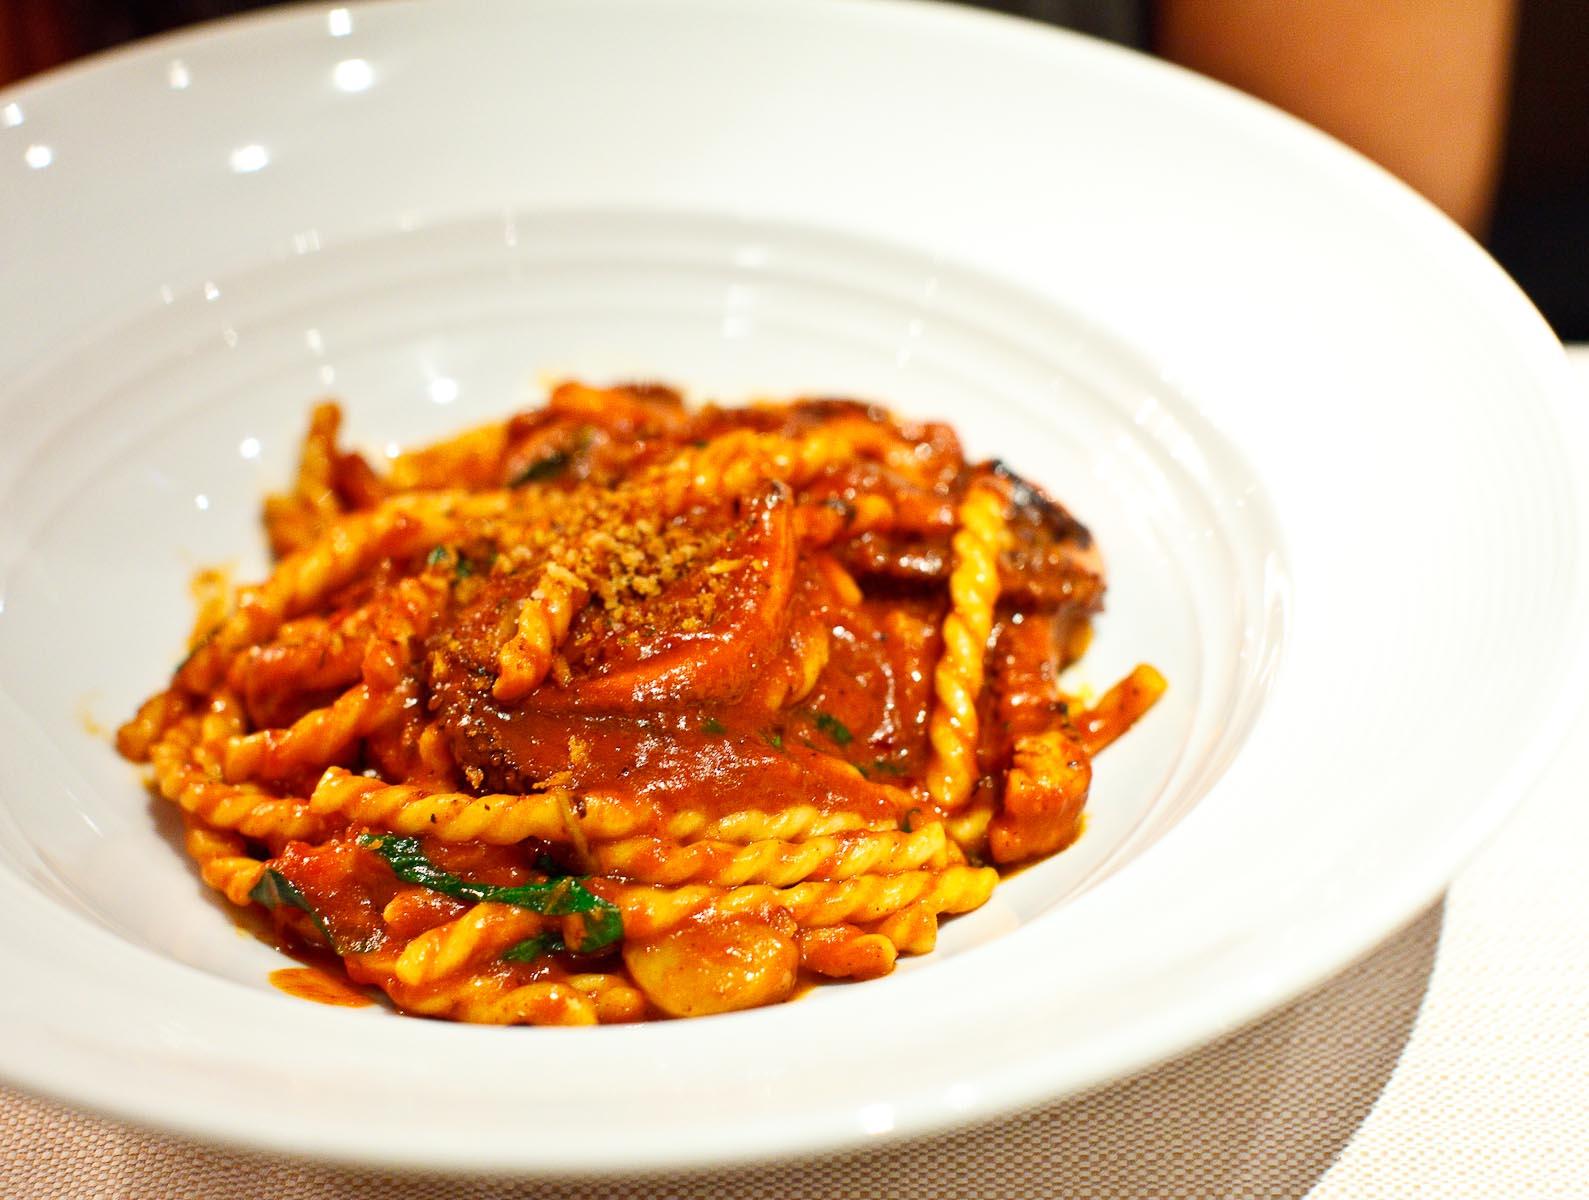 Marea - FUSILLI - red wine braised octopus, bone marrow